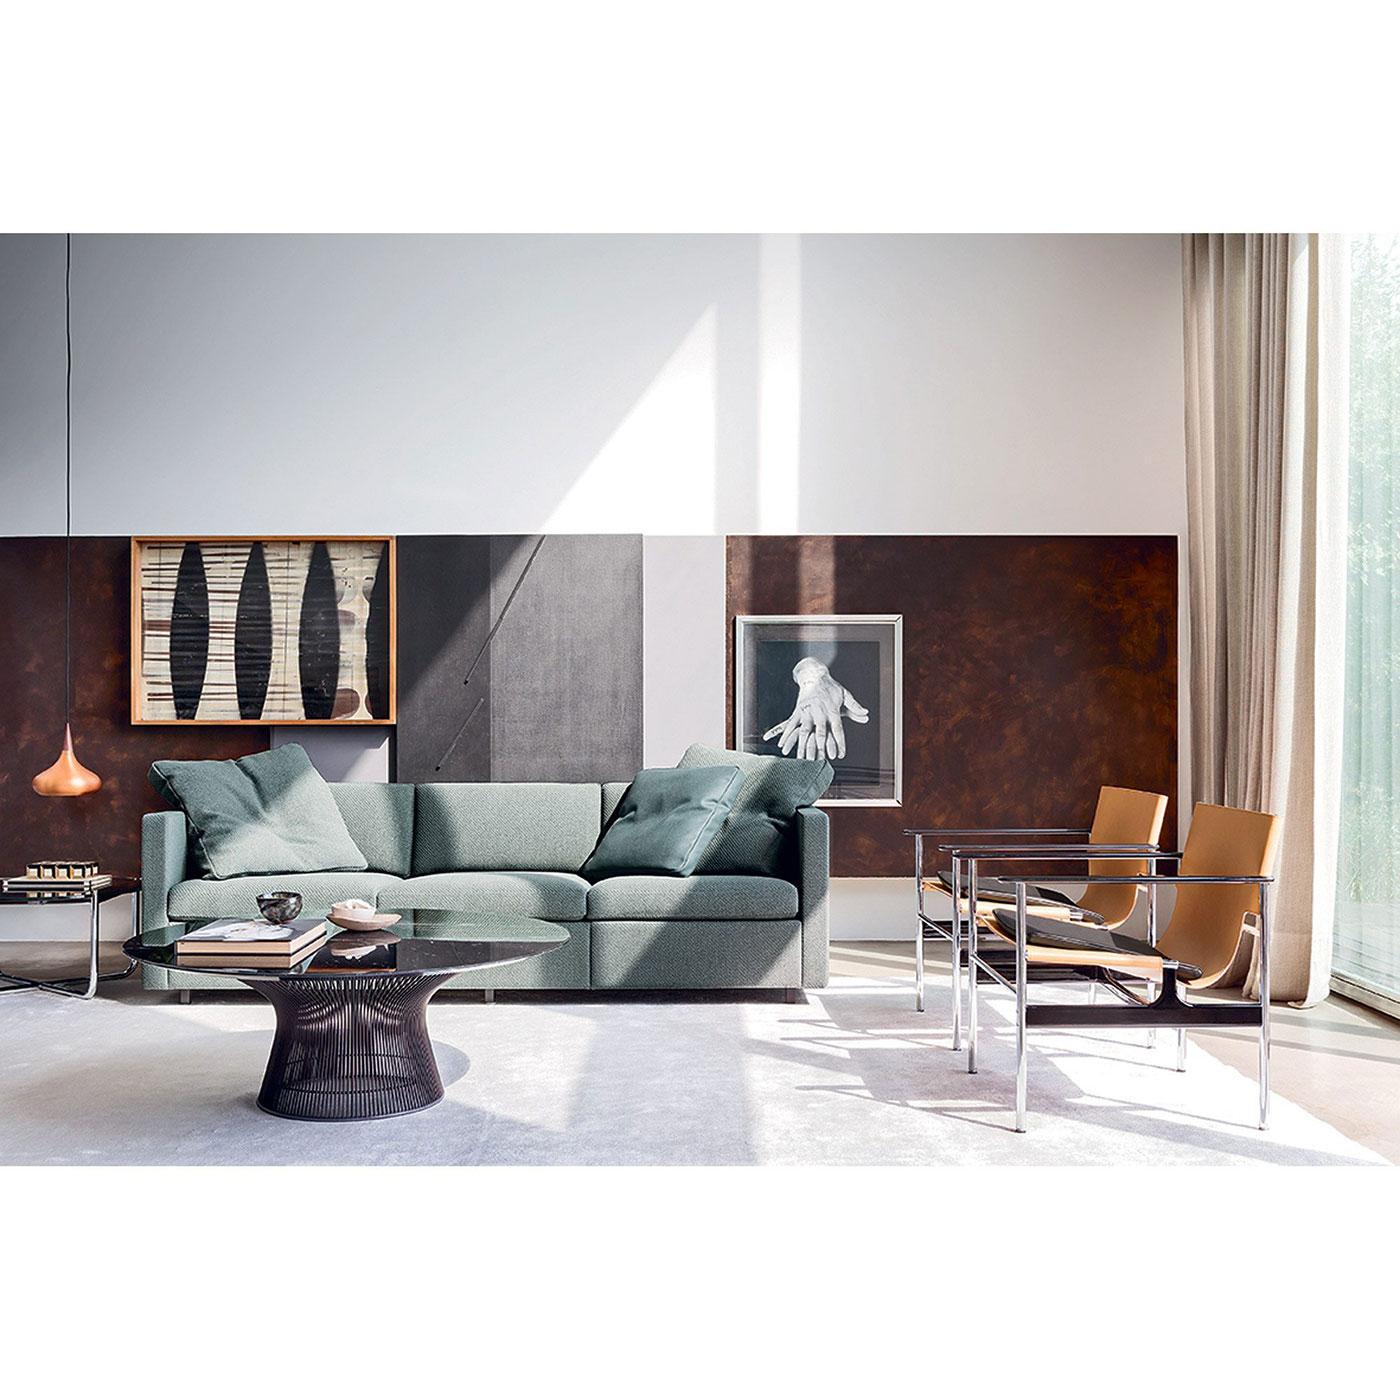 Obegi Home Furniture Knoll pfister sofa